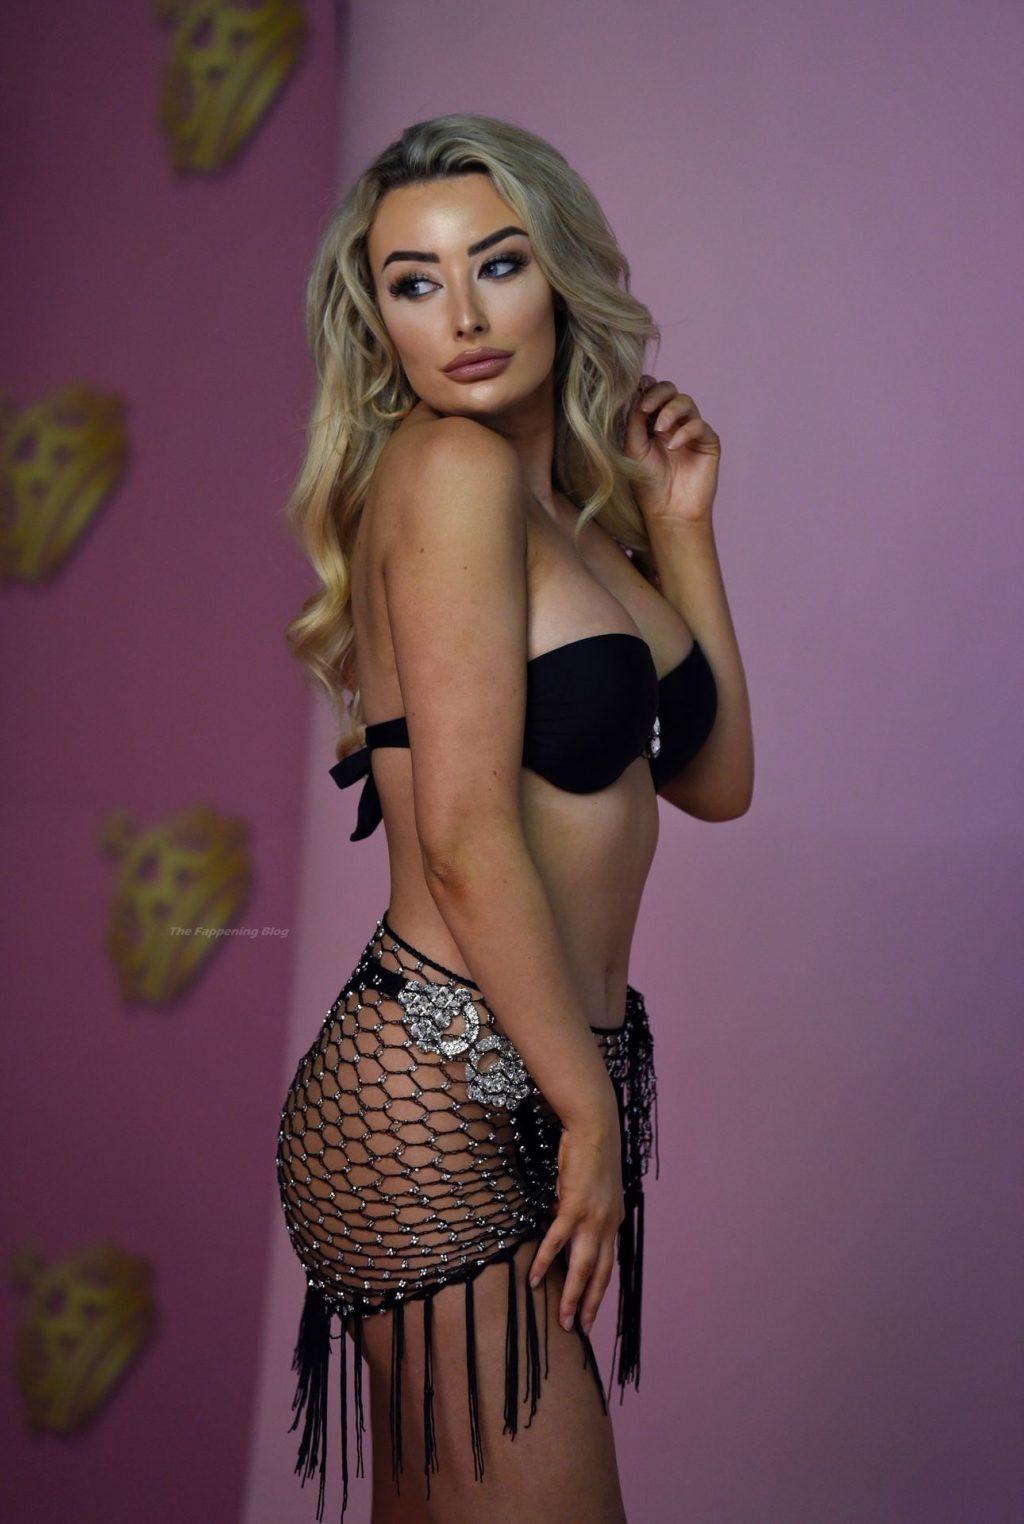 Chloe Crowhurst Makes a New Bikini Shoot (60 Photos)